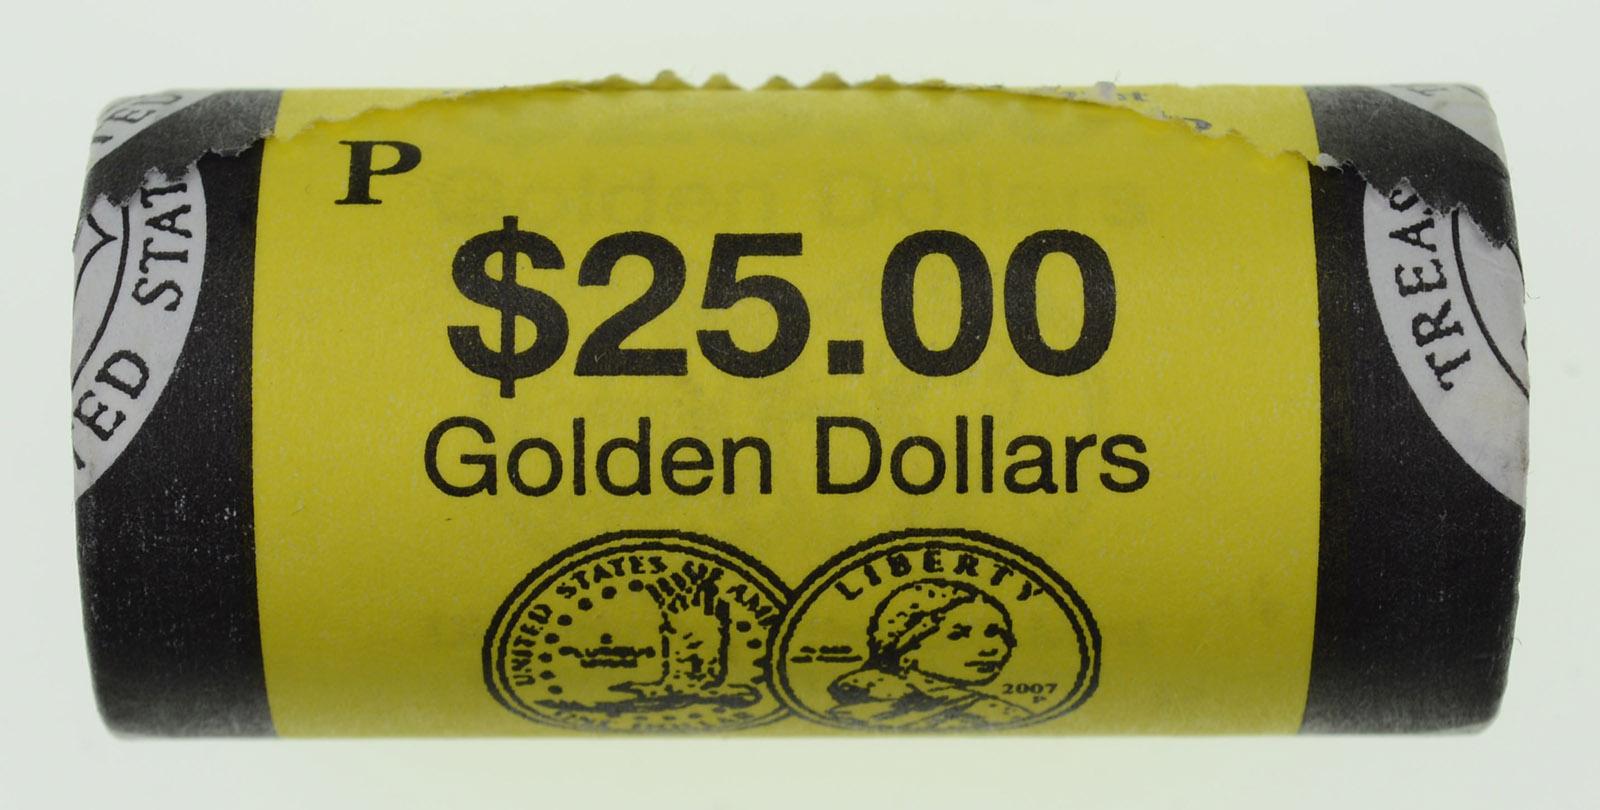 2007 P JEFFERSON GOLDEN $25.00 ORIG BANK WRAPPED ROLLS